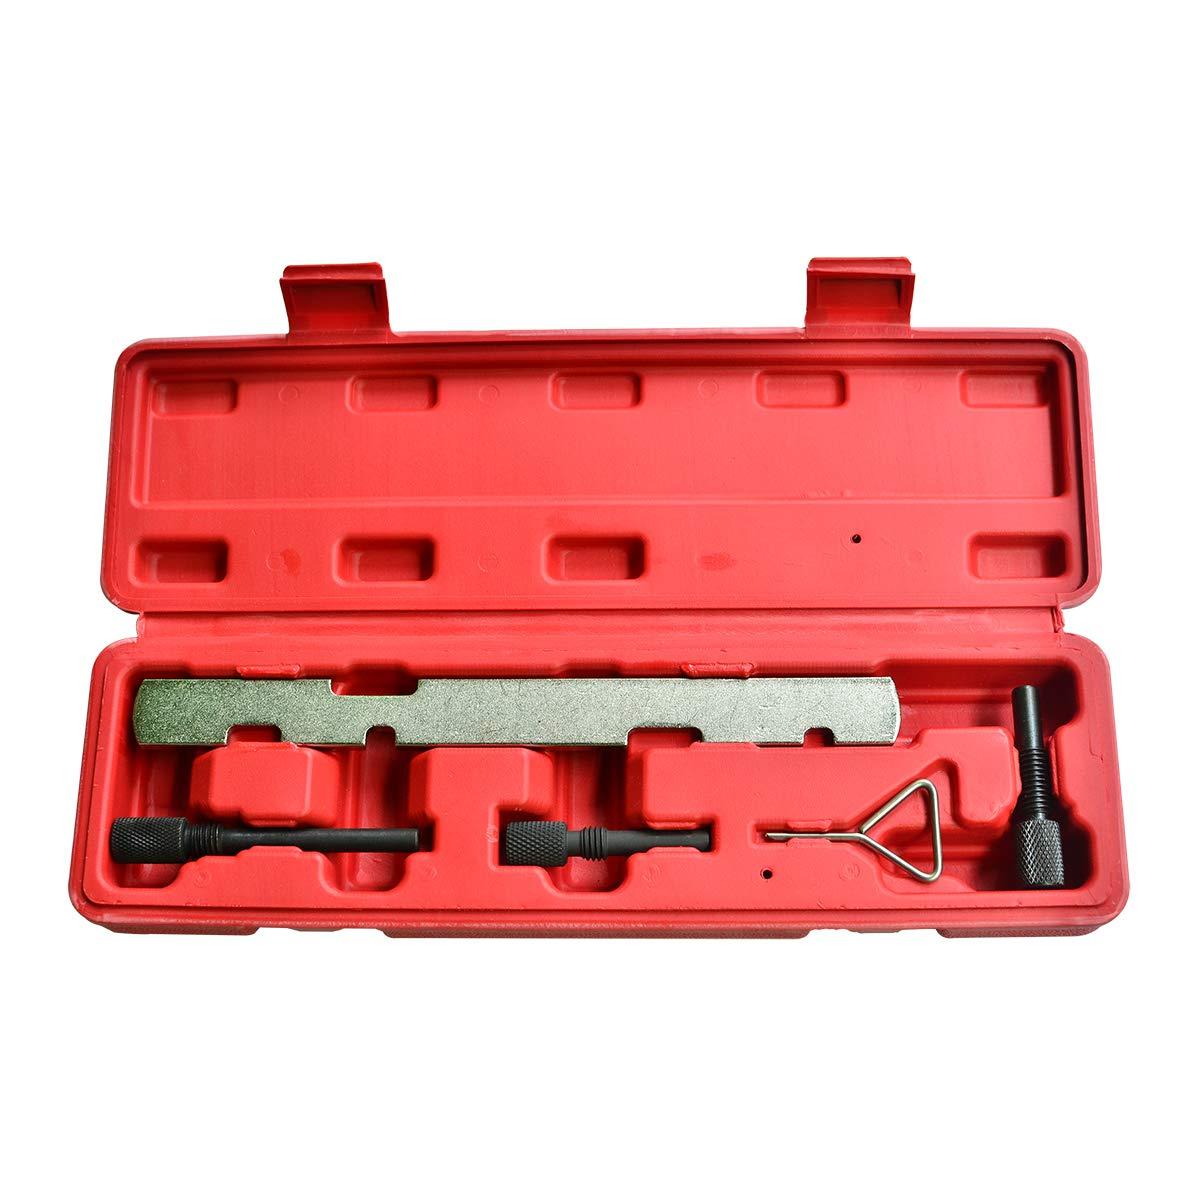 ITEQ Engine Timing Alignment Tool Set Timing Belt Tool Kit for Ford Mazda Fiesta Volvo Camshaft Crankshaft Locking Setting Tools